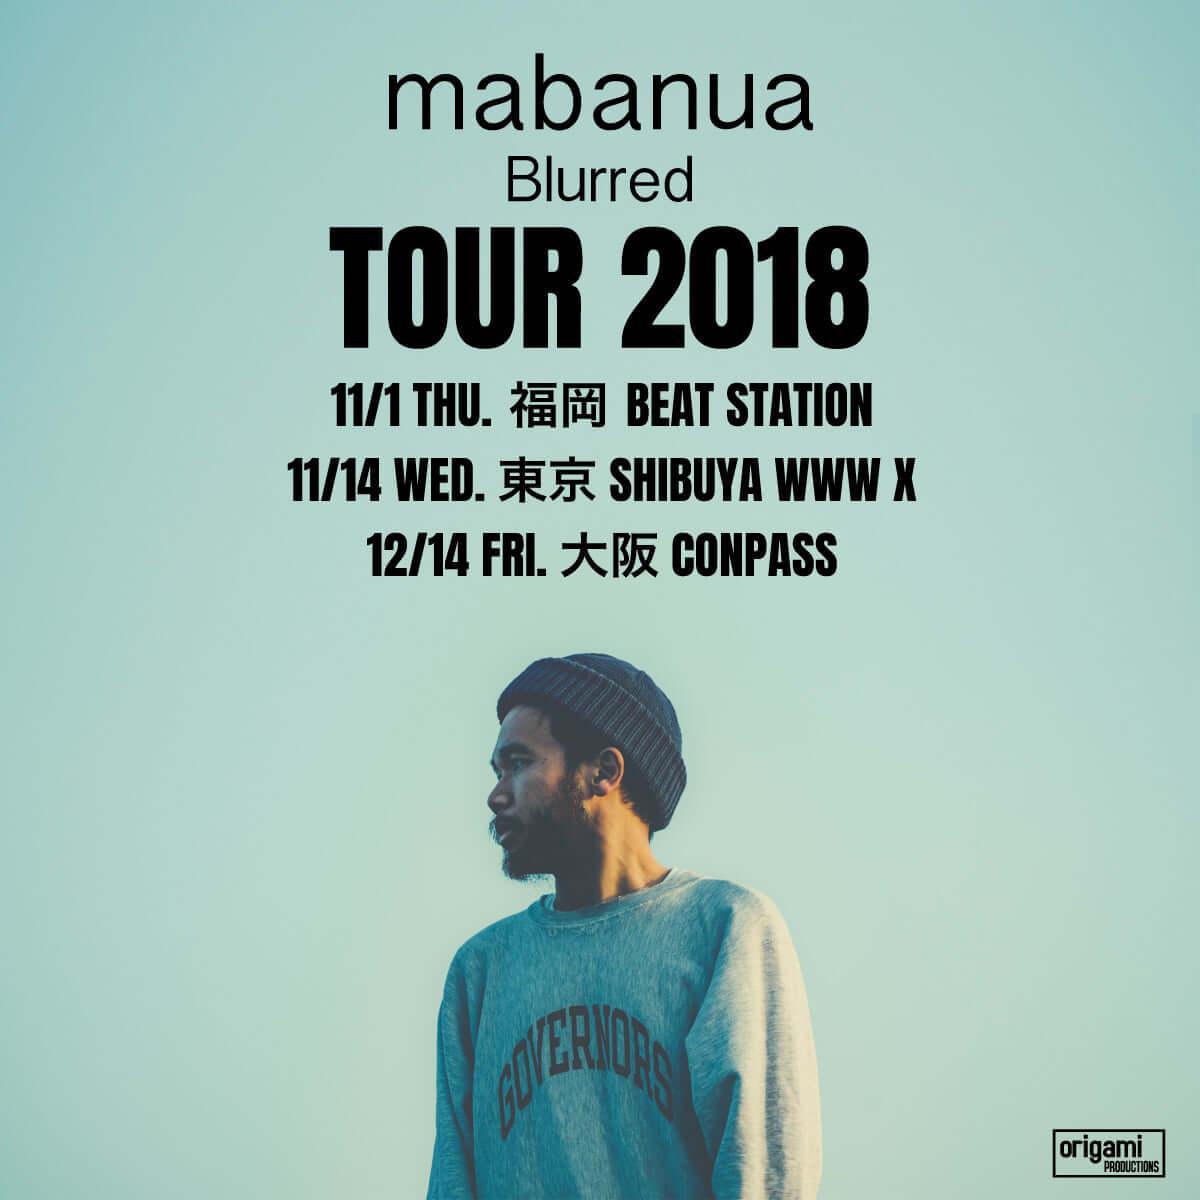 mabanua、『Blurred』リリースツアーが東京・大阪・福岡で開催決定!OvallのShingo Suzuki、関口シンゴも参加 music180918_mabanua_01-1200x1200